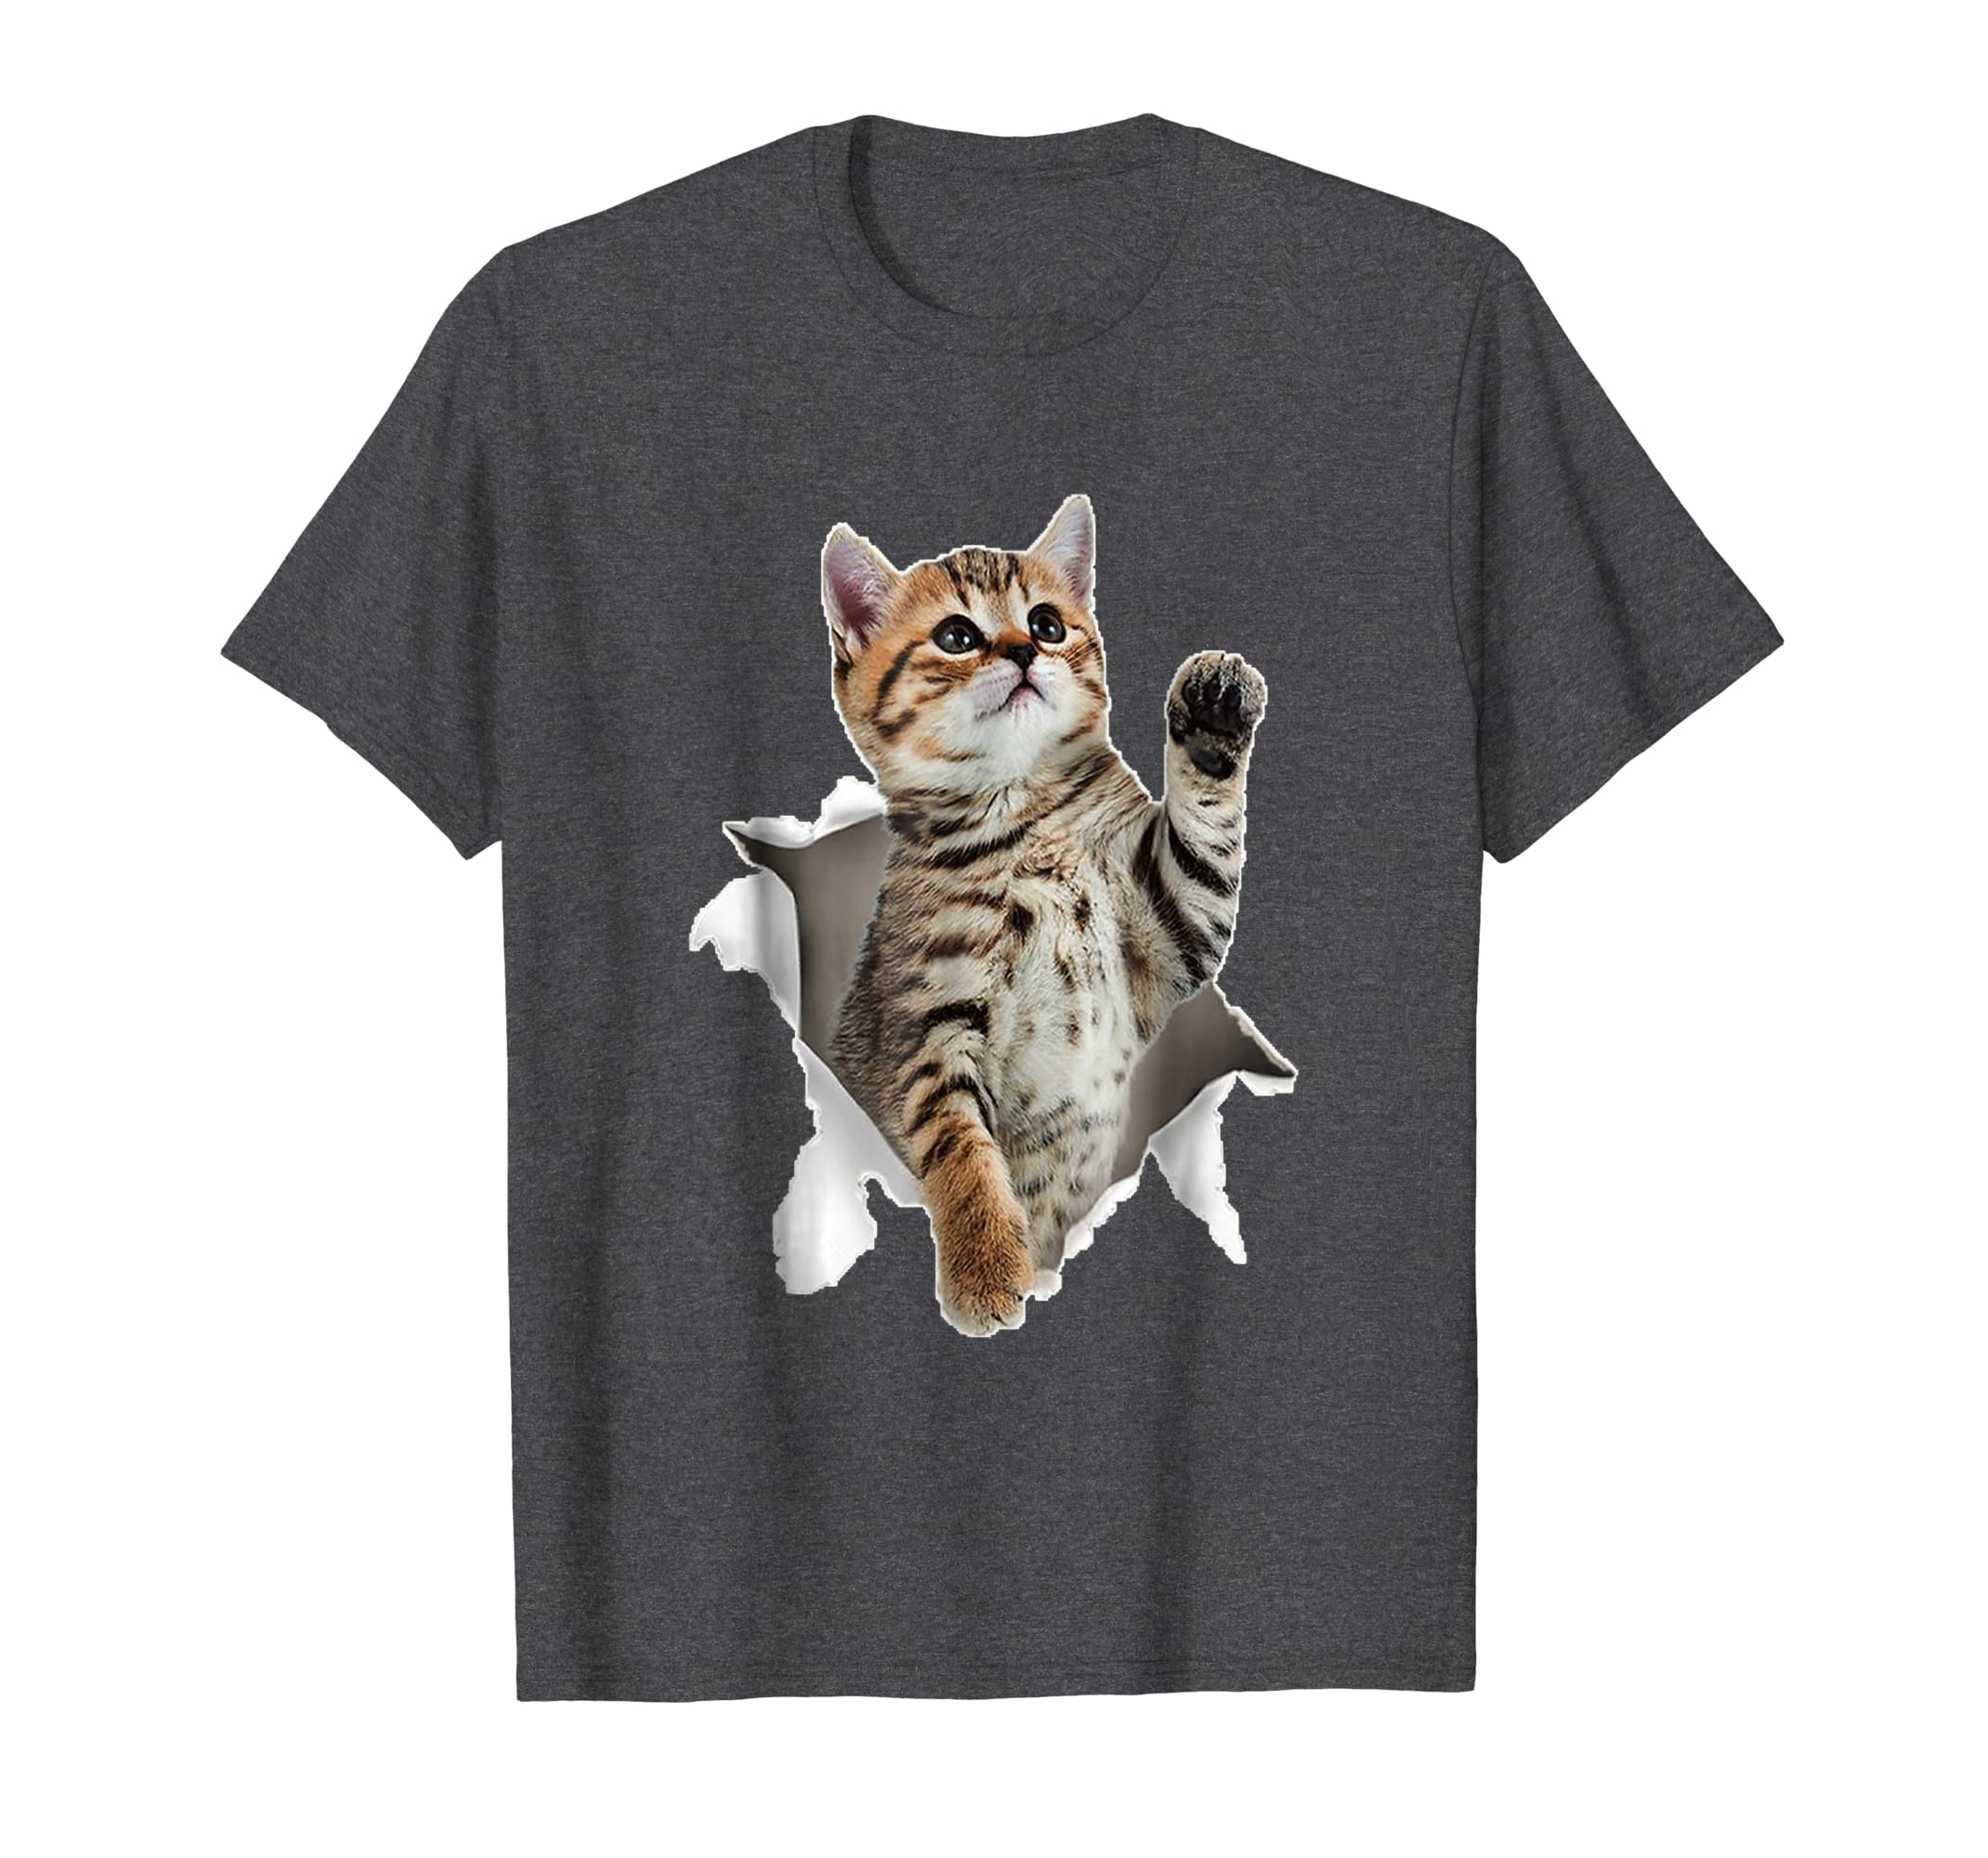 ac500b3e Amazon.com: Golden Bengal Cat Lover T-Shirt Gift For Women Men: Clothing